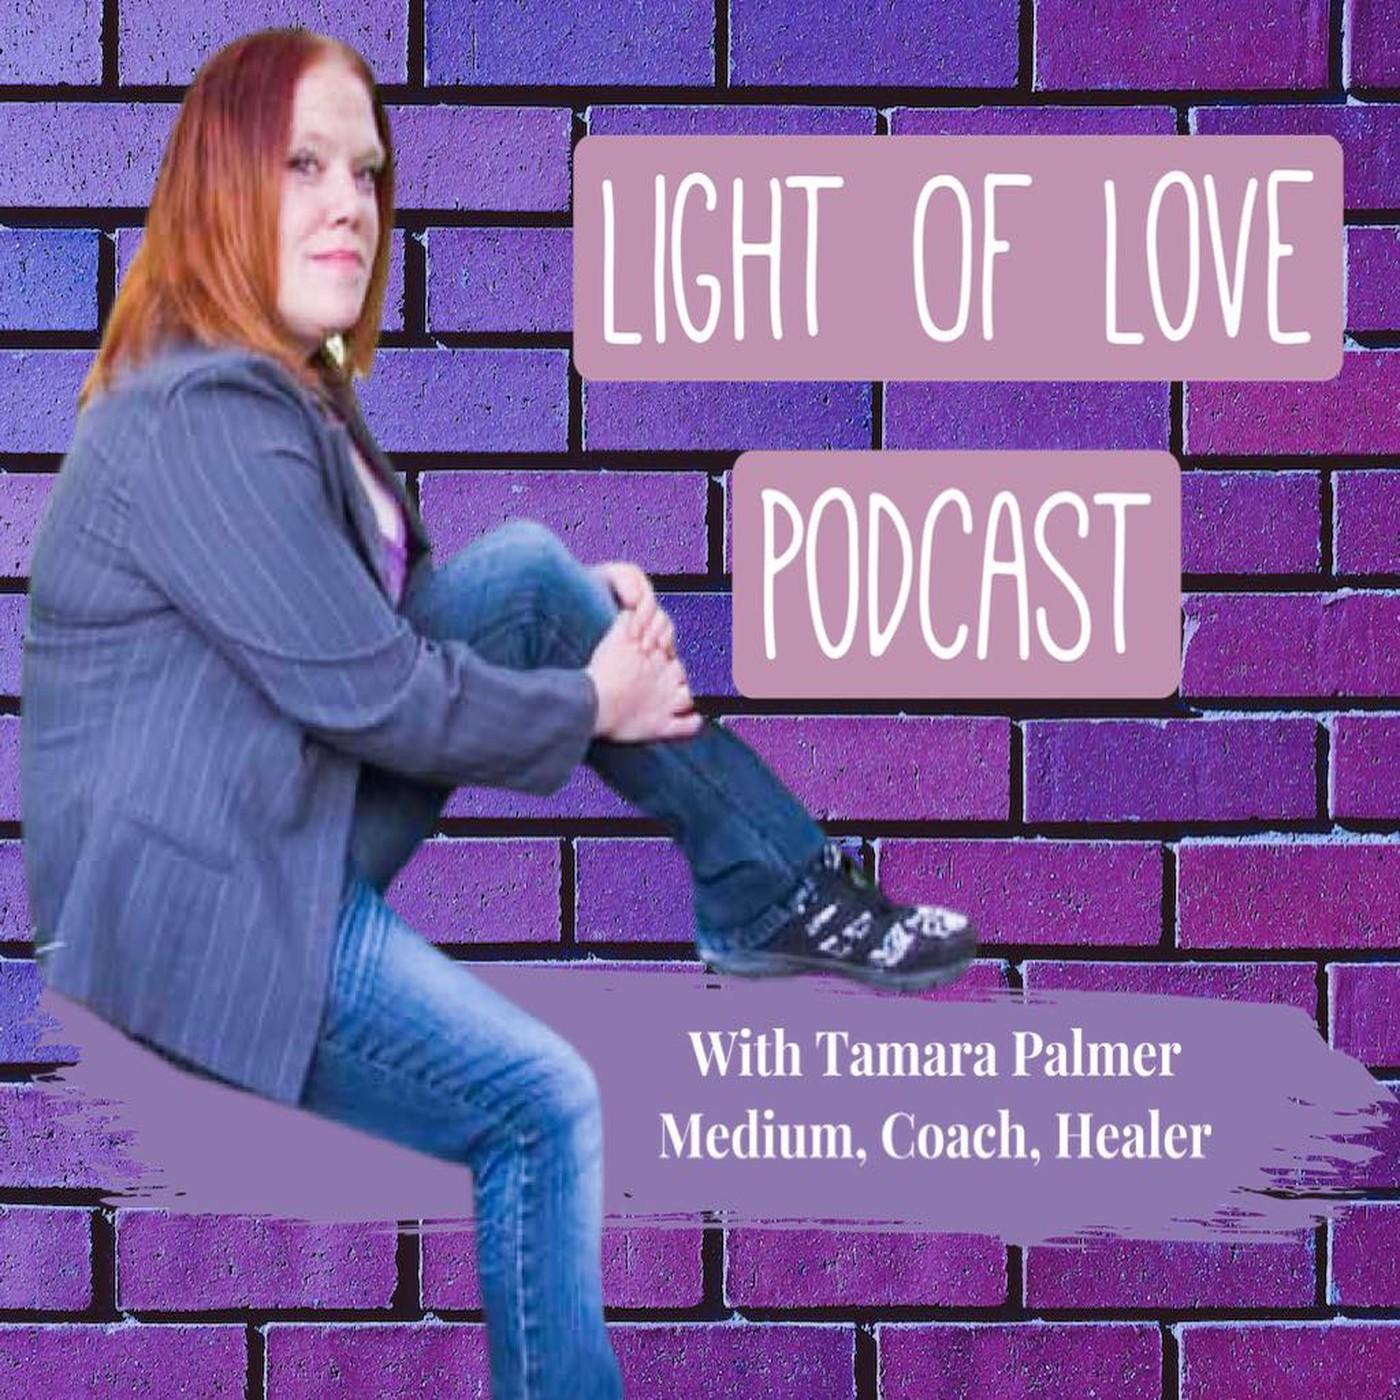 Light Of Love Podcast with Tamara Palmer Medium, Coach, Healer